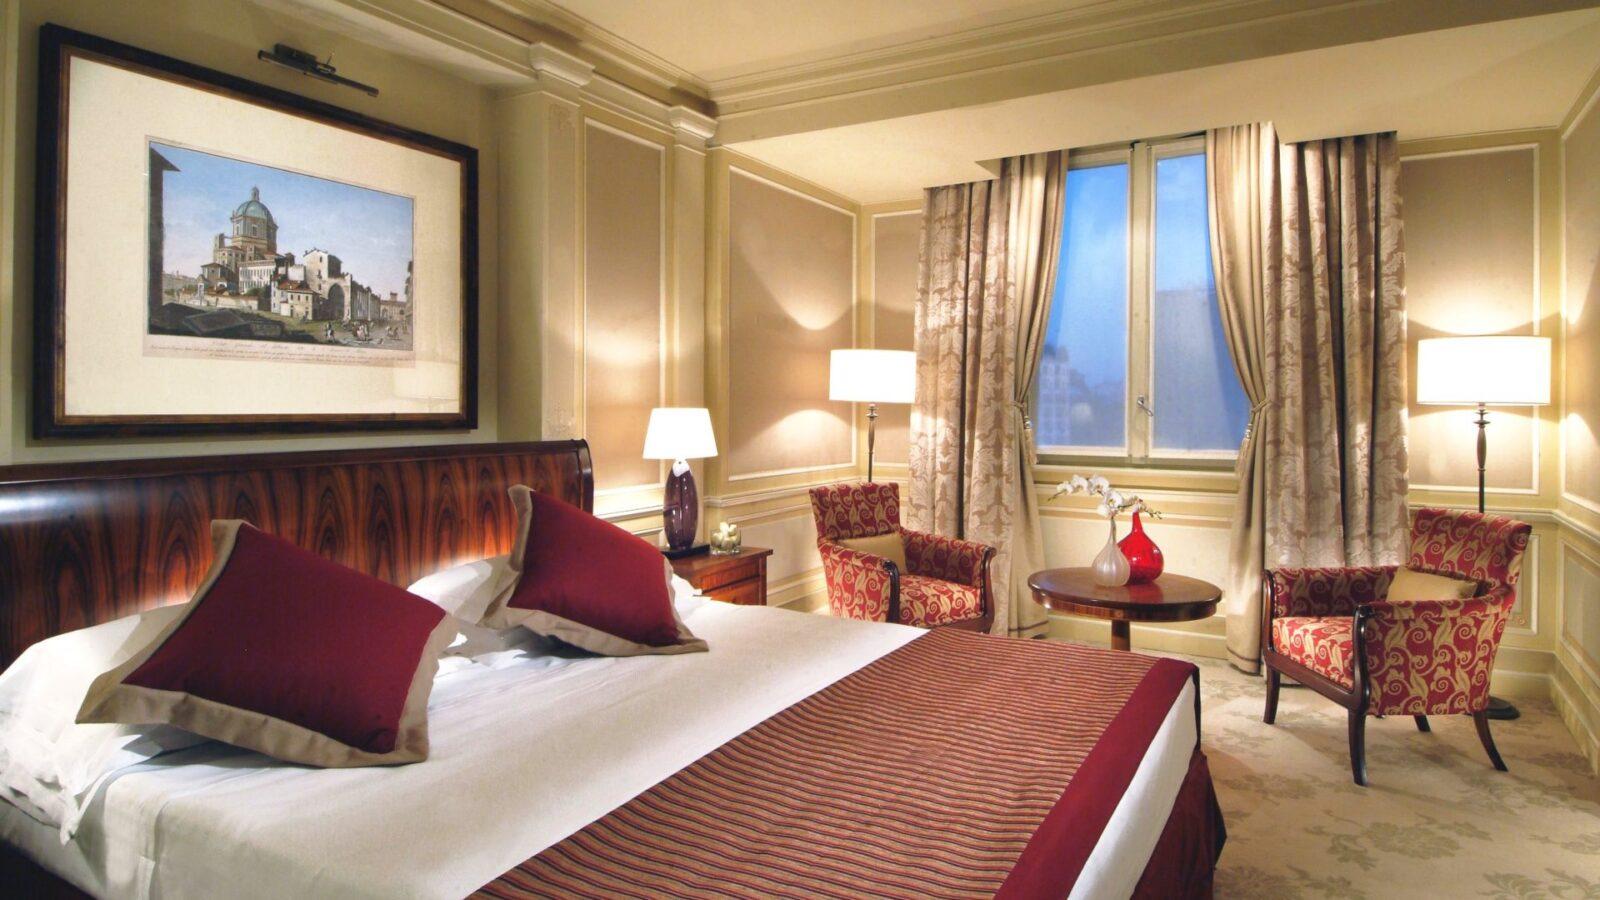 Mosaic Room Neo Classical, Hotel Principe di Savoia